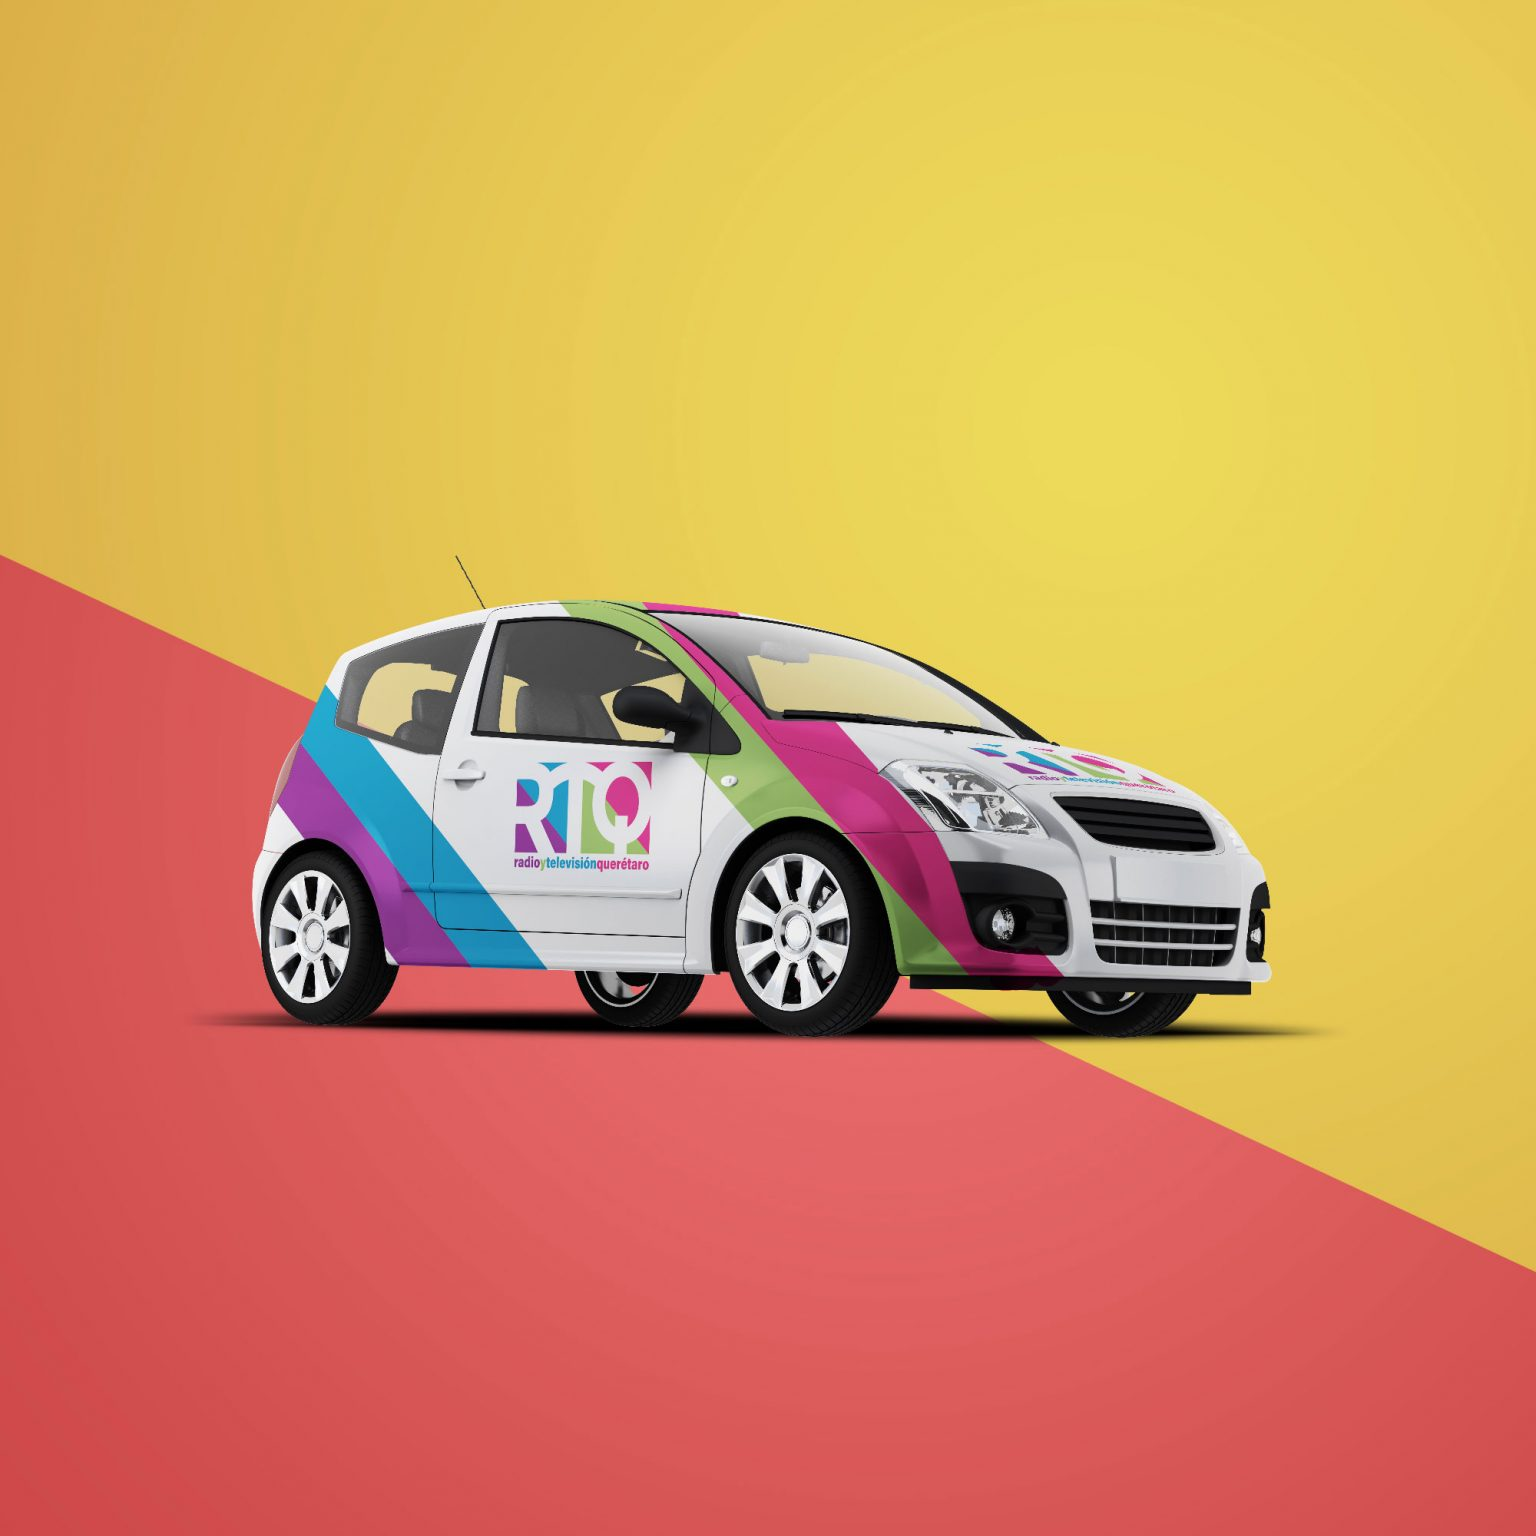 RTQ automóvil